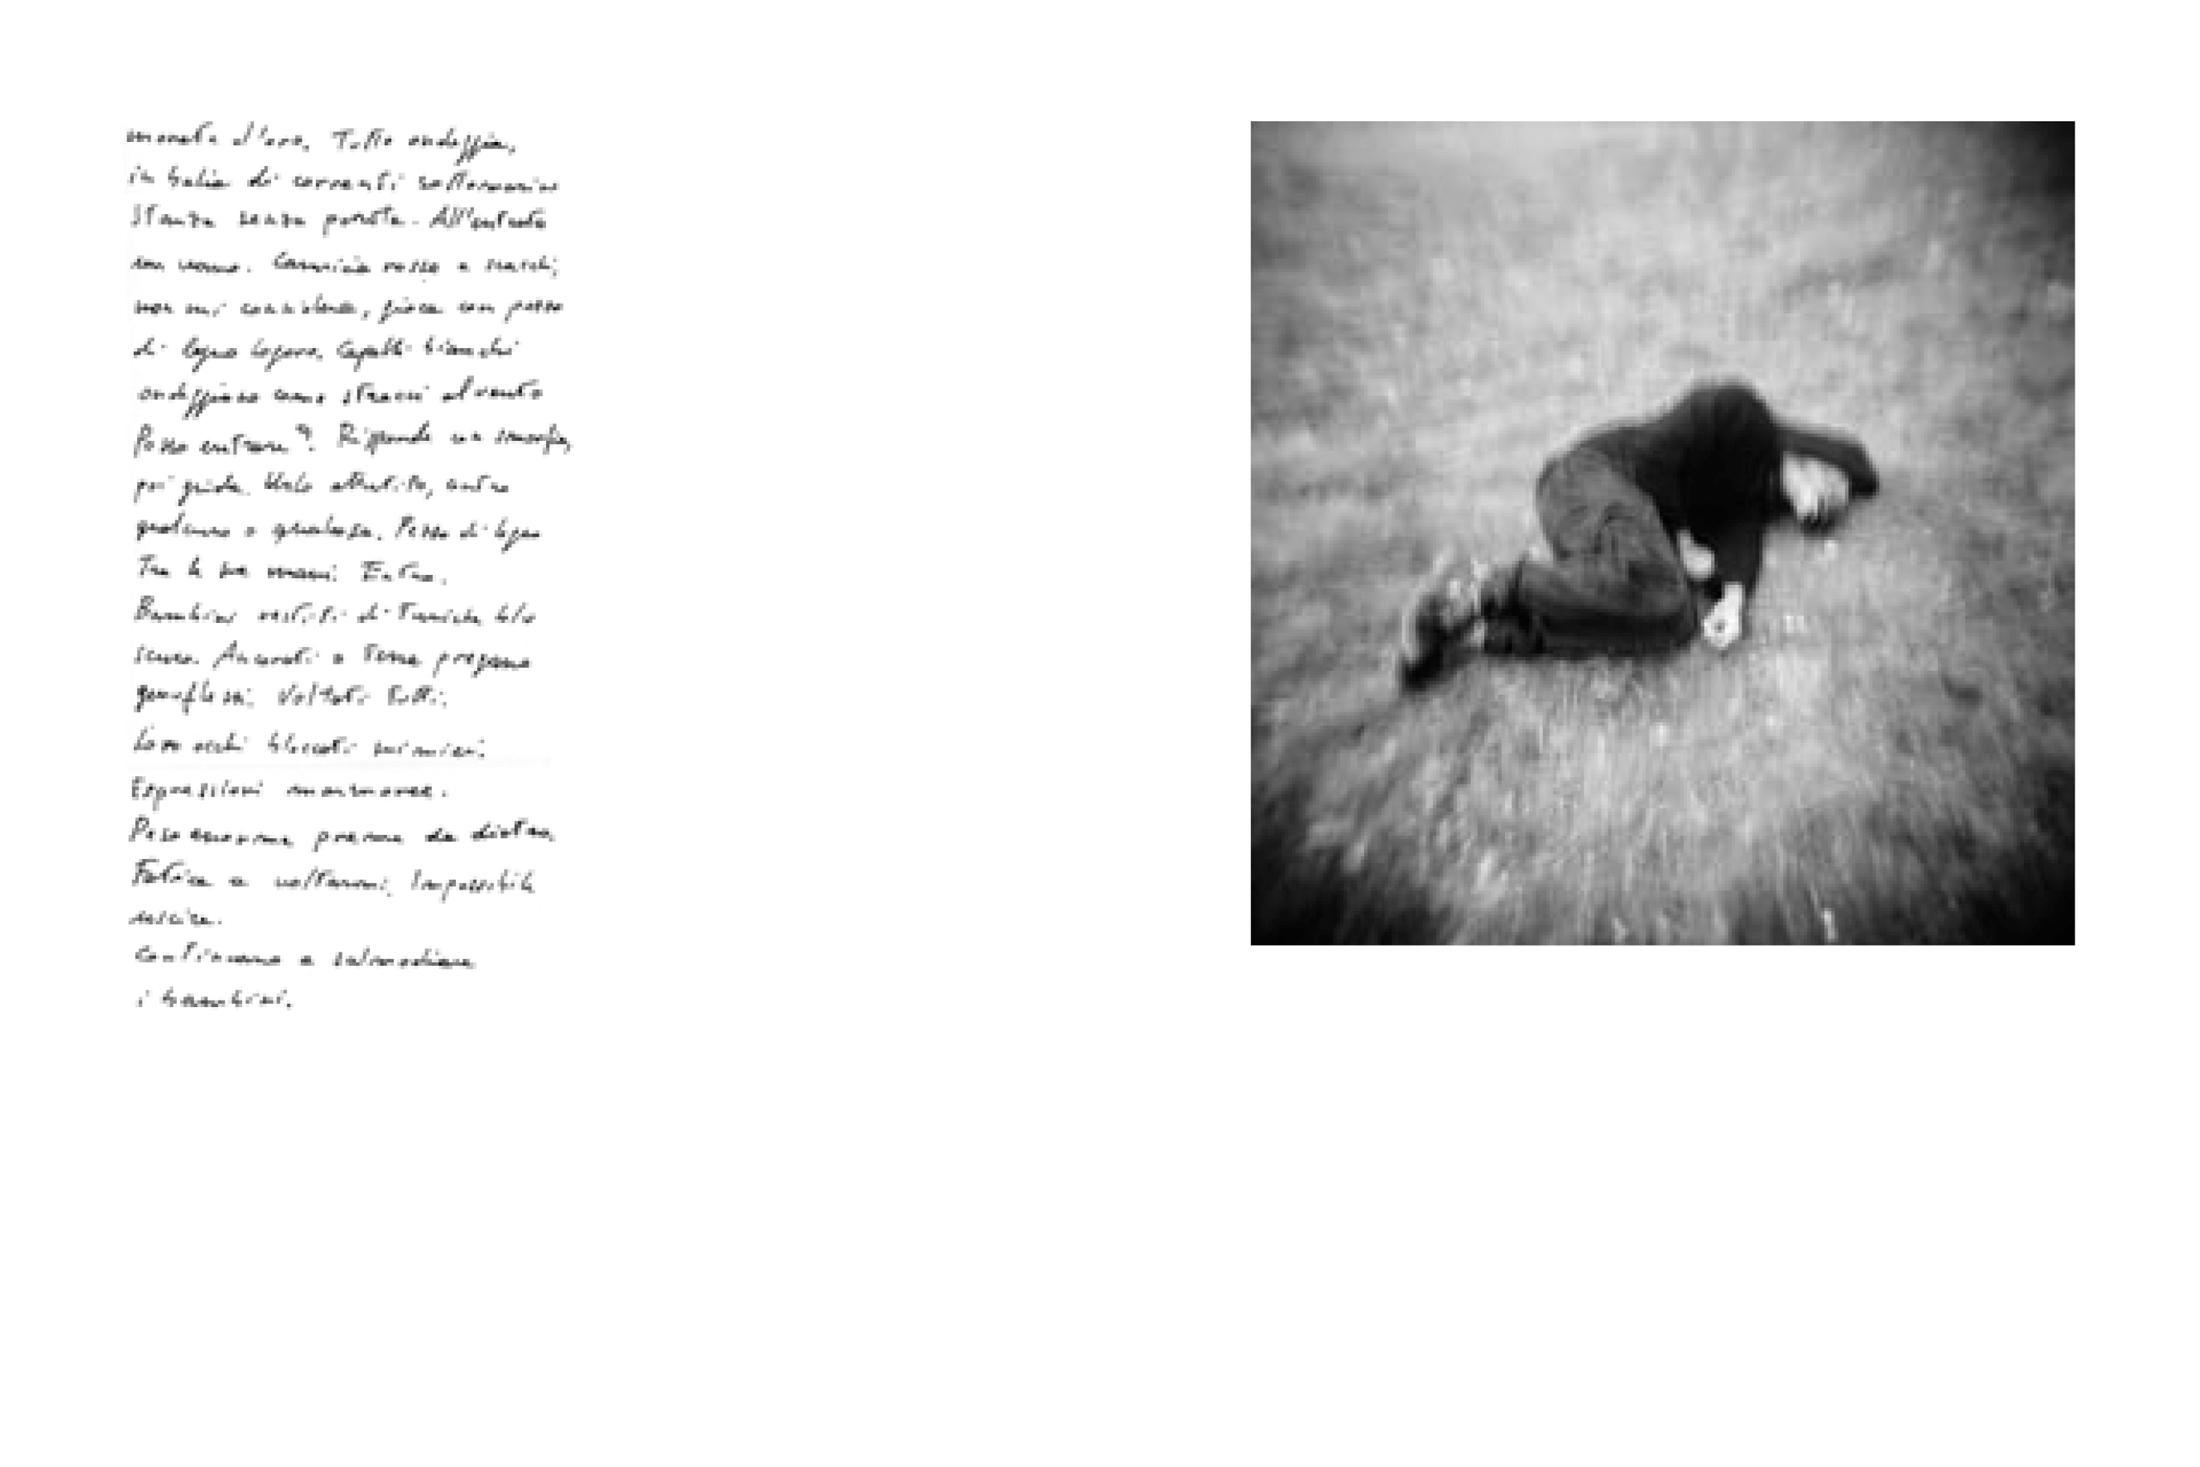 NuncStans_2_Booklet_Inside_12P-5.jpg